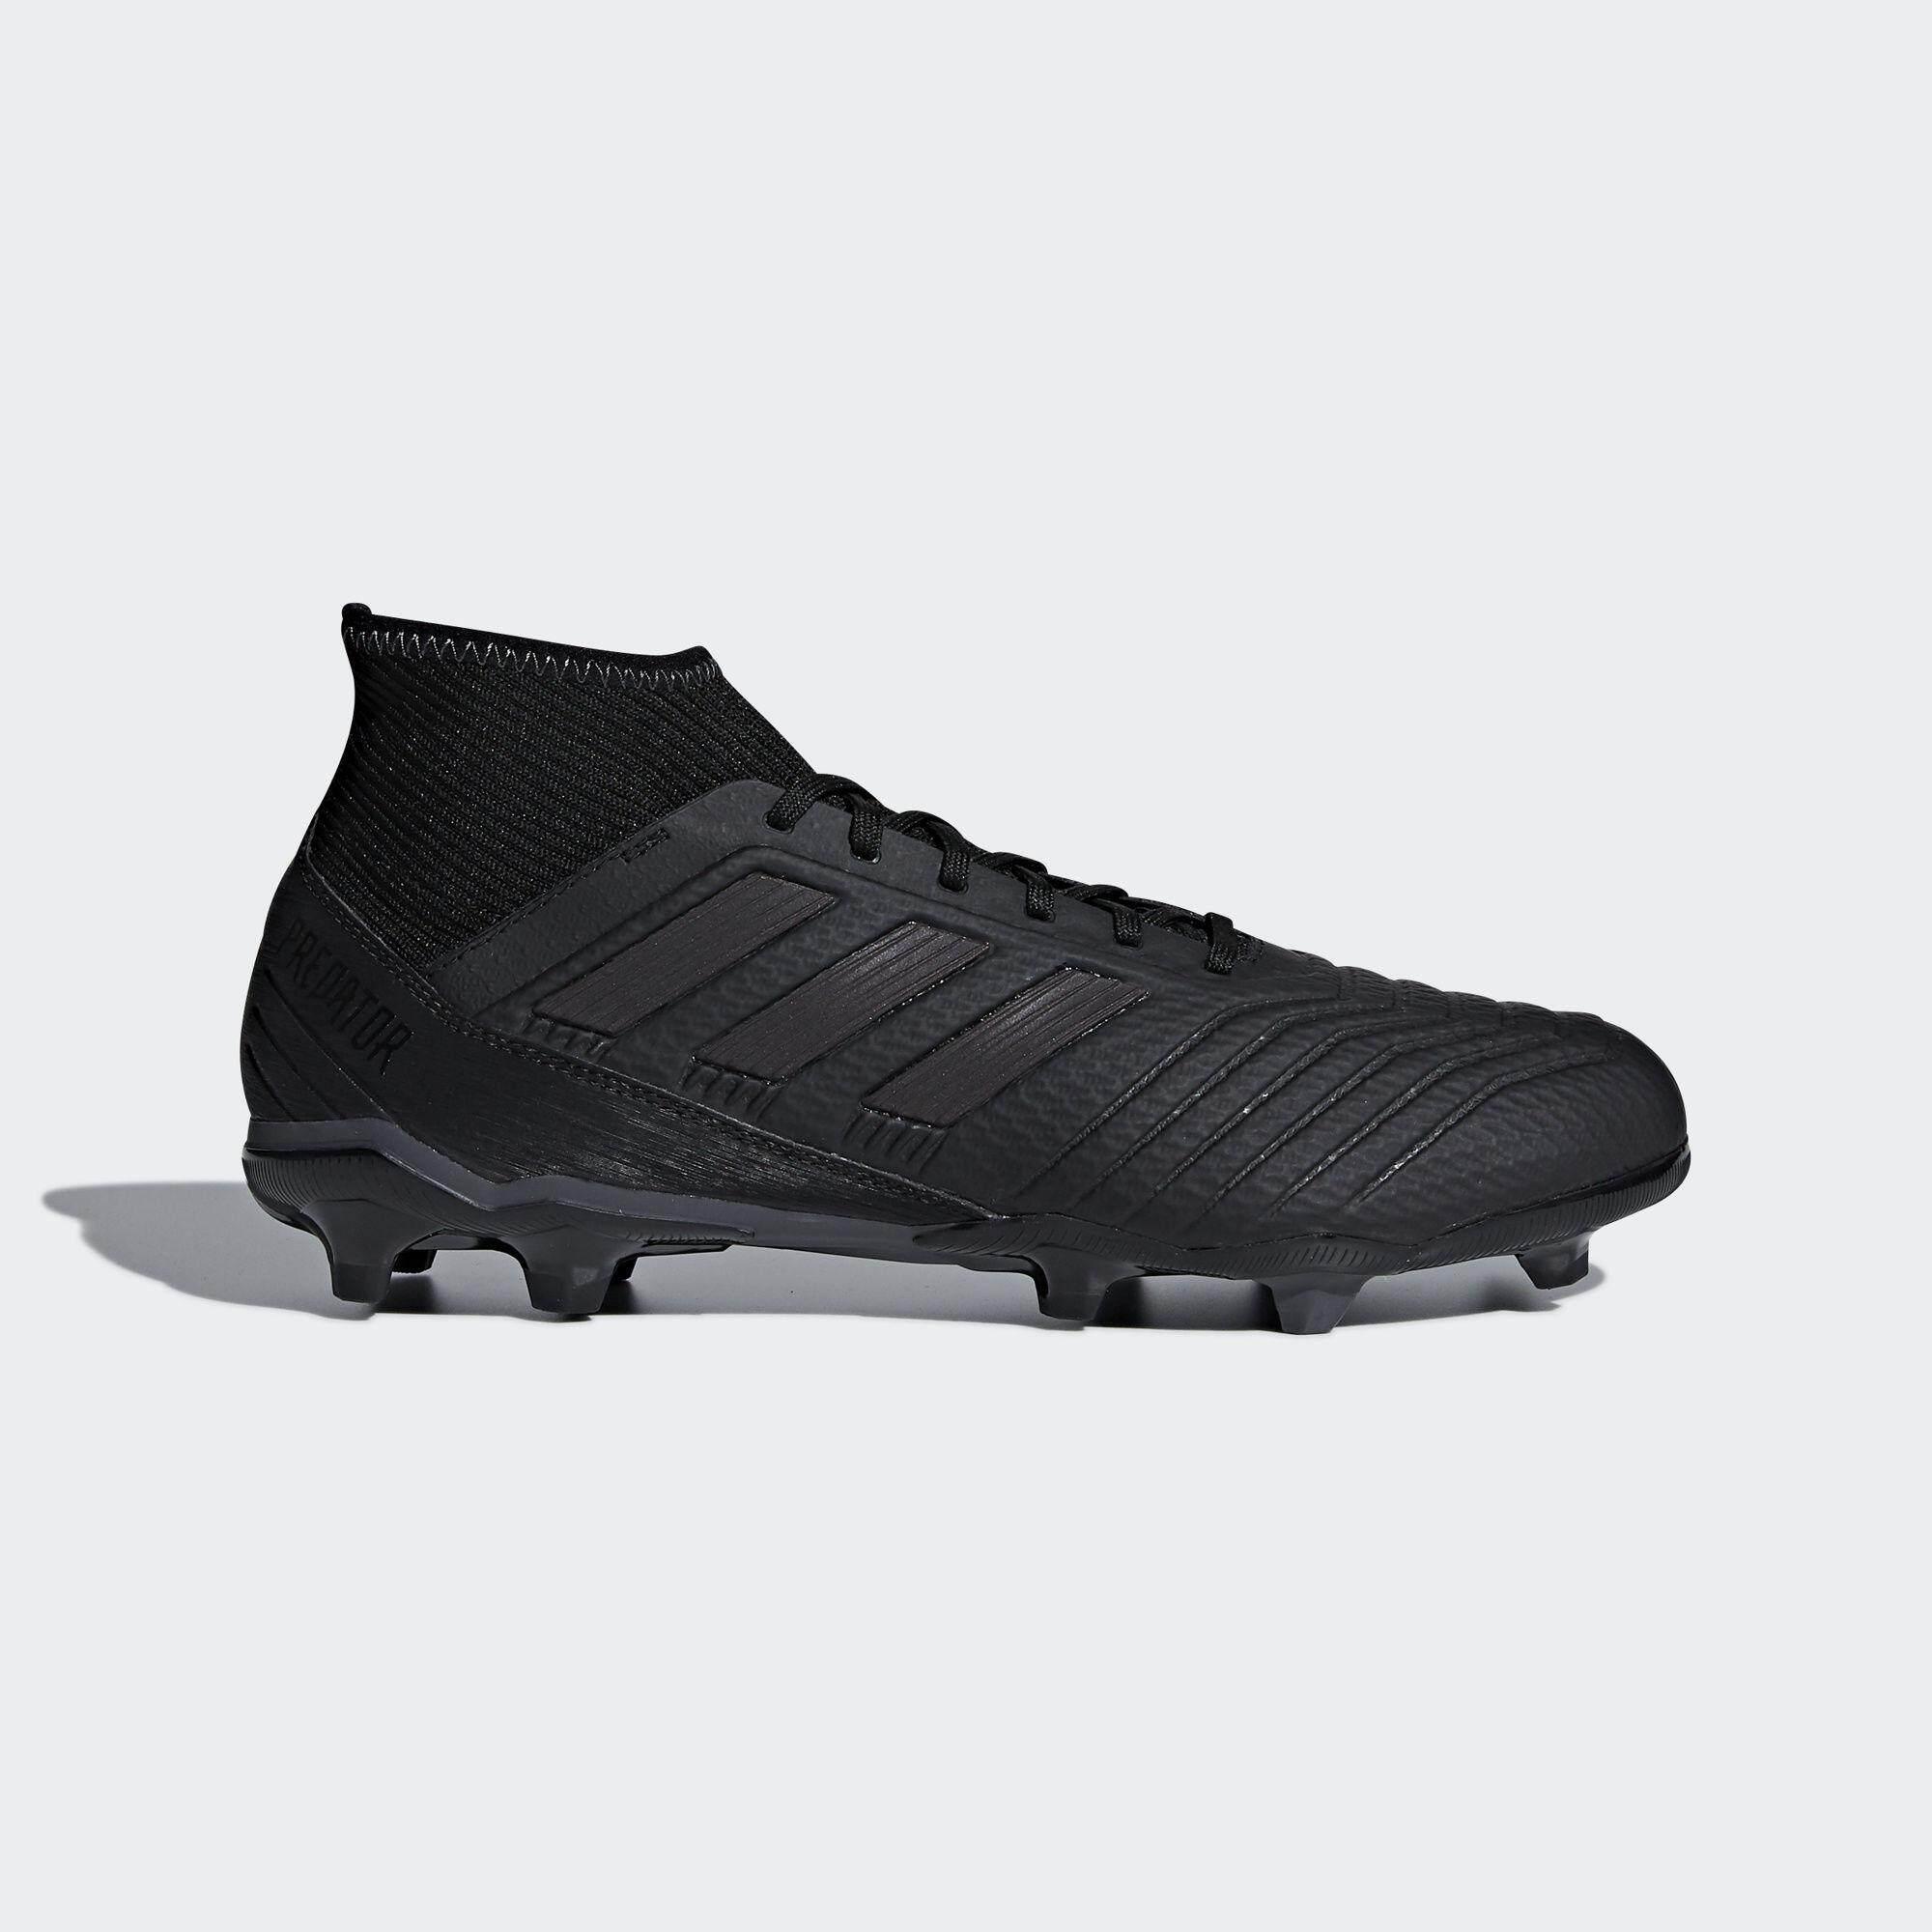 fafc85137edd Adidas รองเท้า ฟุตบอล อดิดาส Football Shoe Predator 18.3 FIRM GROUND ...